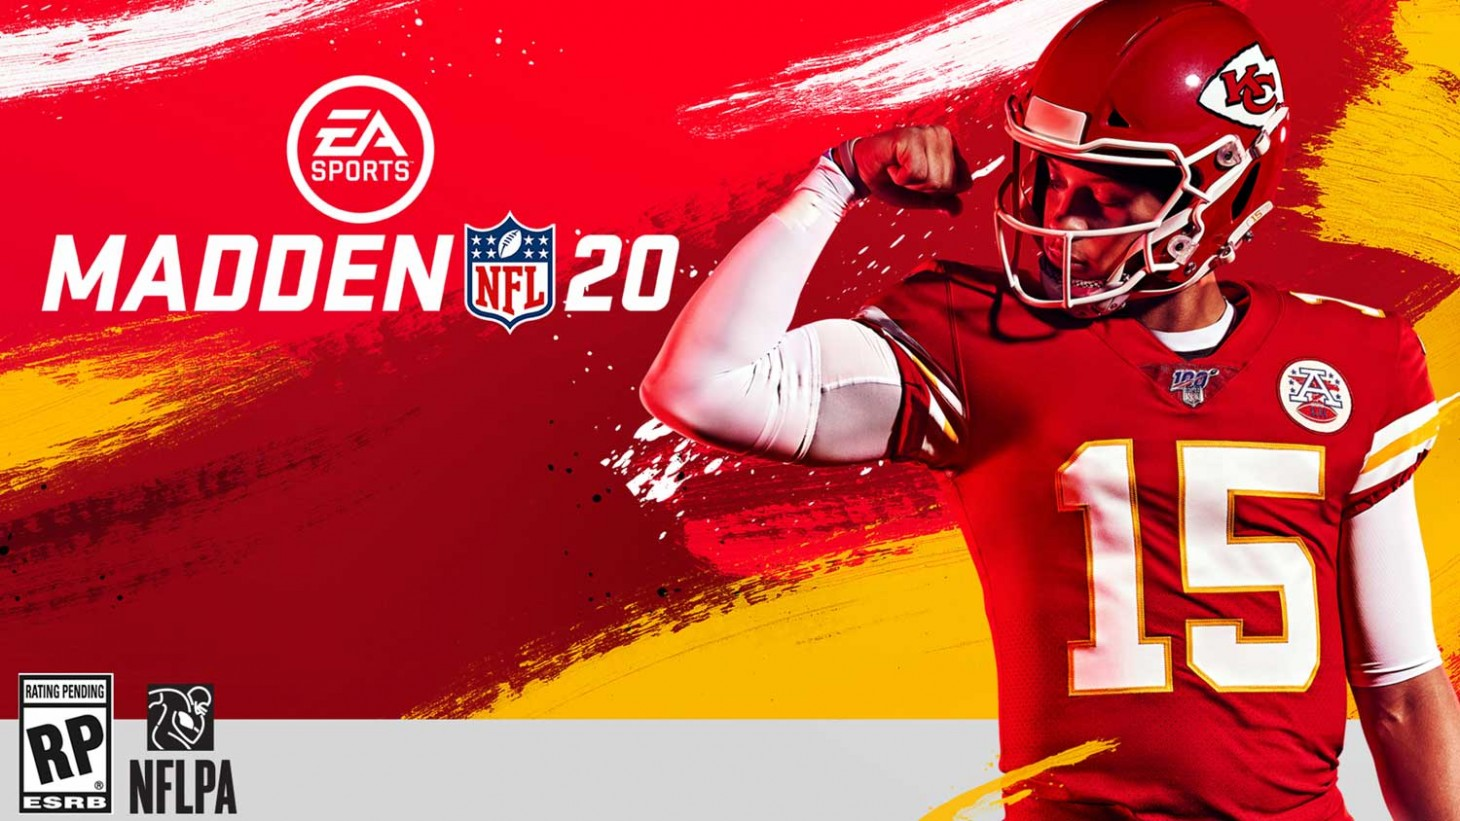 a160acfc371 Chiefs QB Patrick Mahomes Named Madden NFL 20 Cover Star - Game Informer